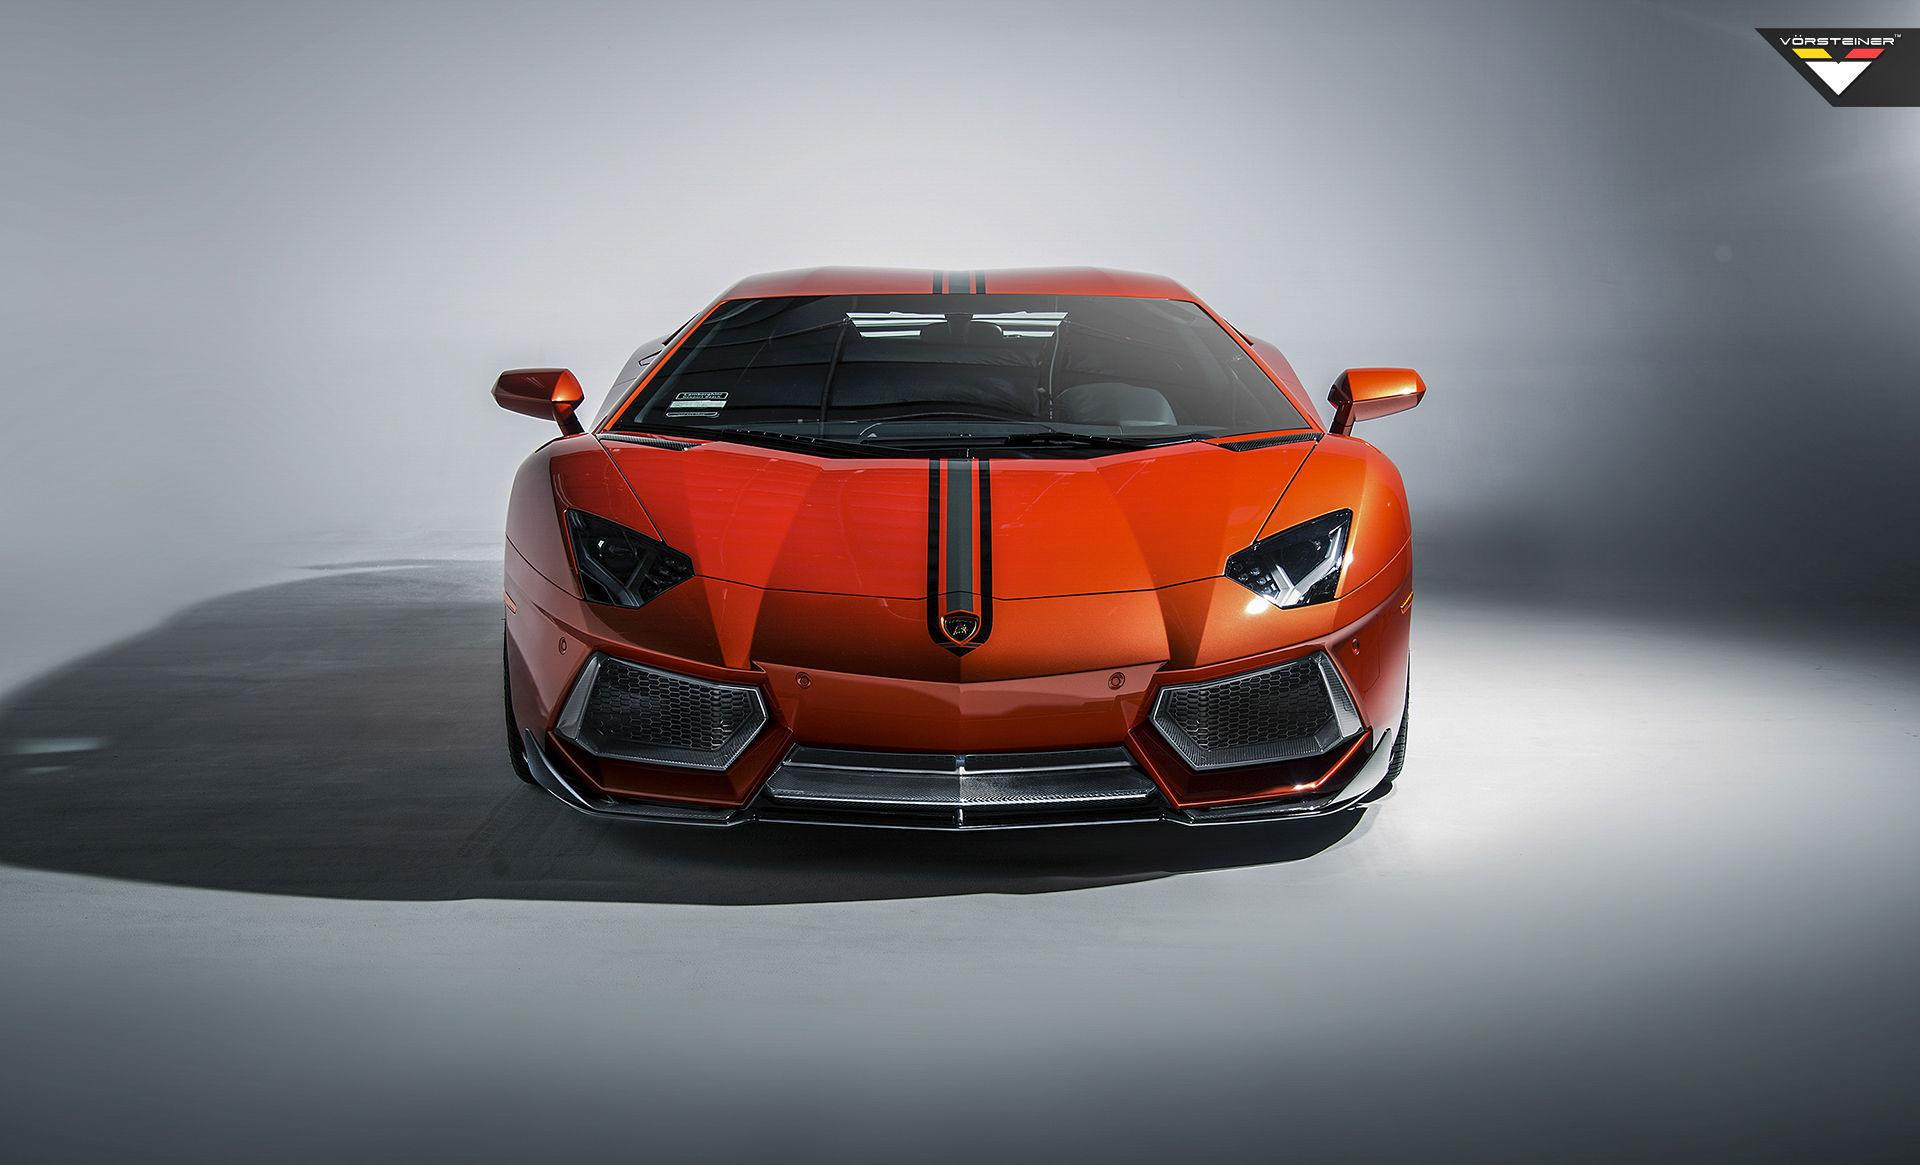 2014 Lamborghini Aventador | Vorsteiner AVENTADOR-V for the Coupe / Roadster